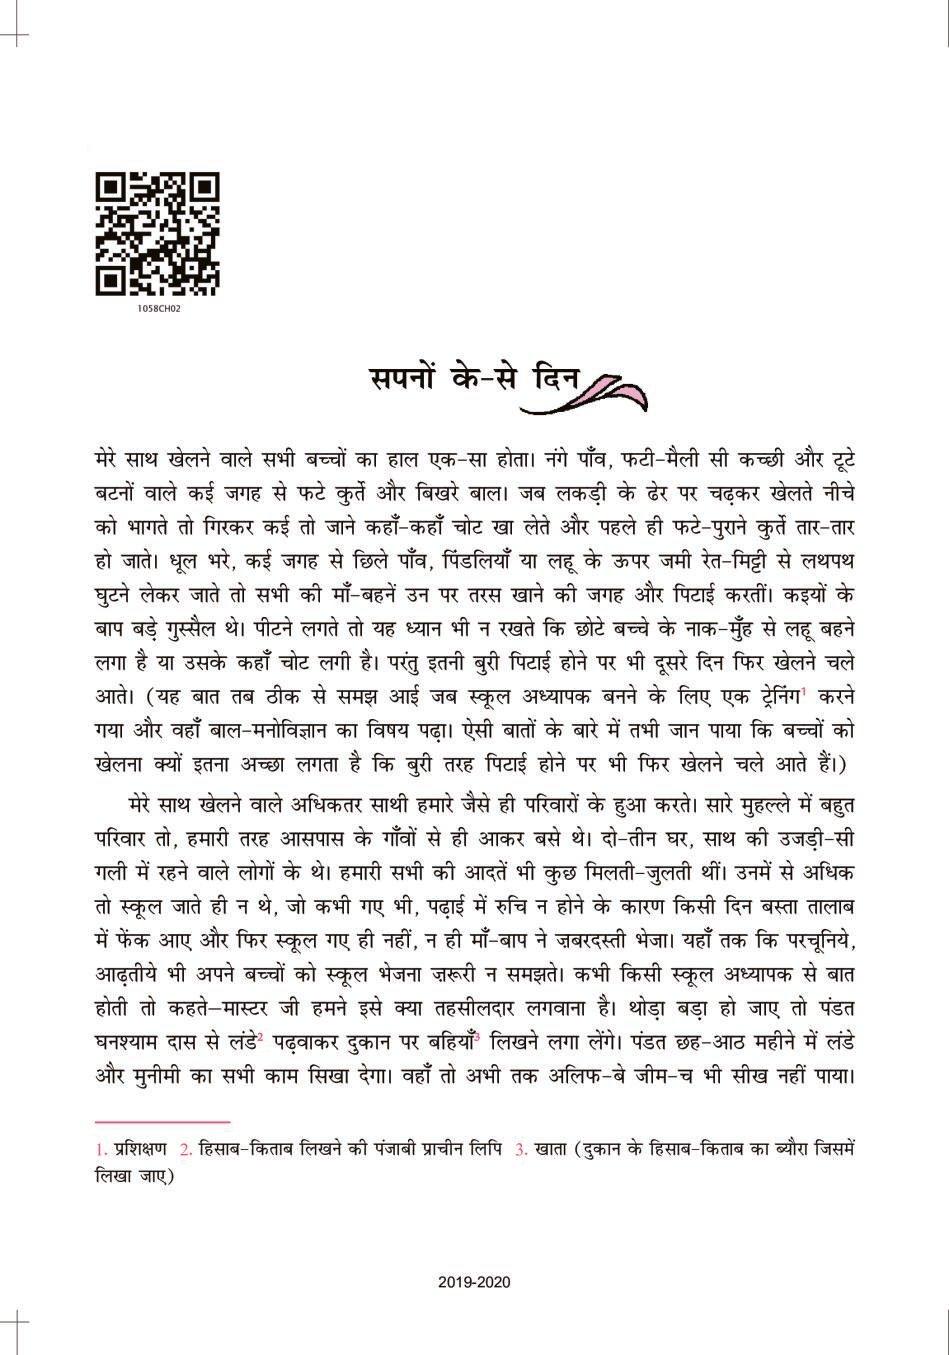 NCERT Book Class 10 Hindi (संचयन) Chapter 2 सपनों के-से दिन - Page 1